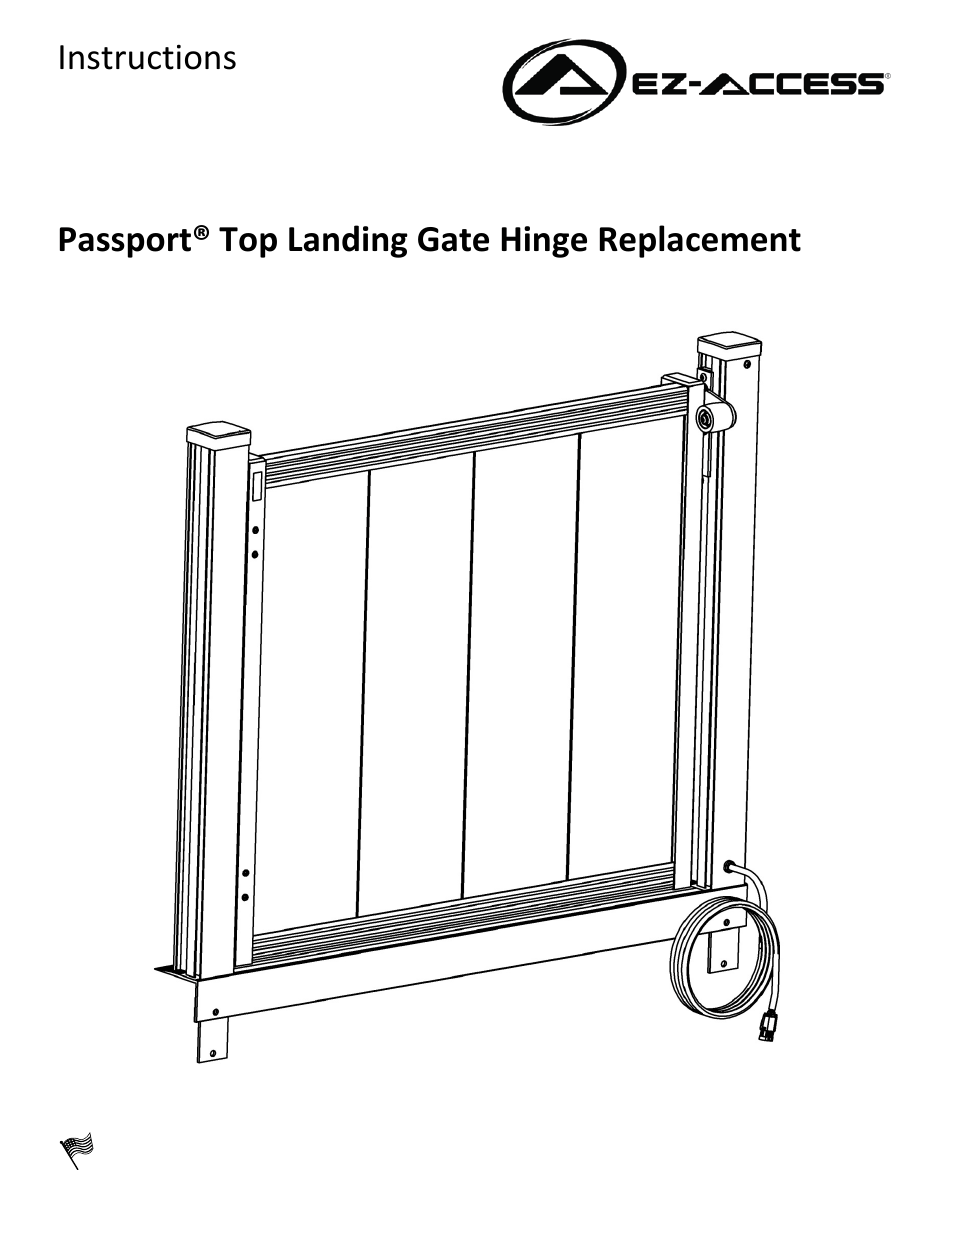 EZ-ACCESS PASSPORT TOP LANDING GATE HINGE REPLACEMENT User